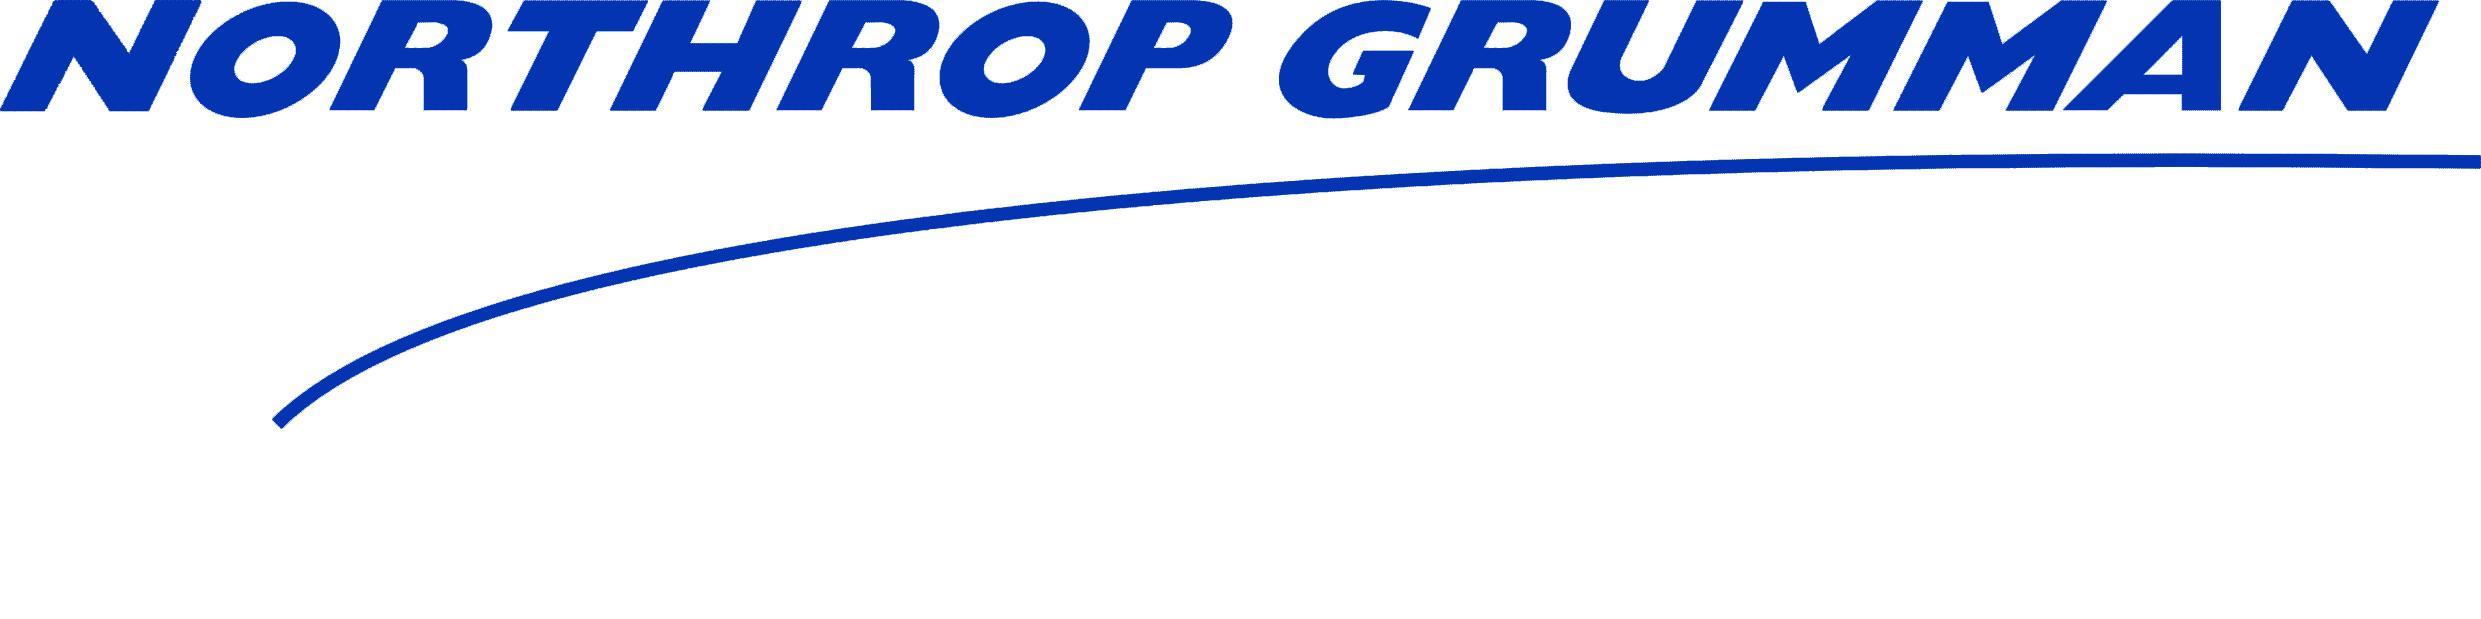 NorthropGrumman-logo.jpg